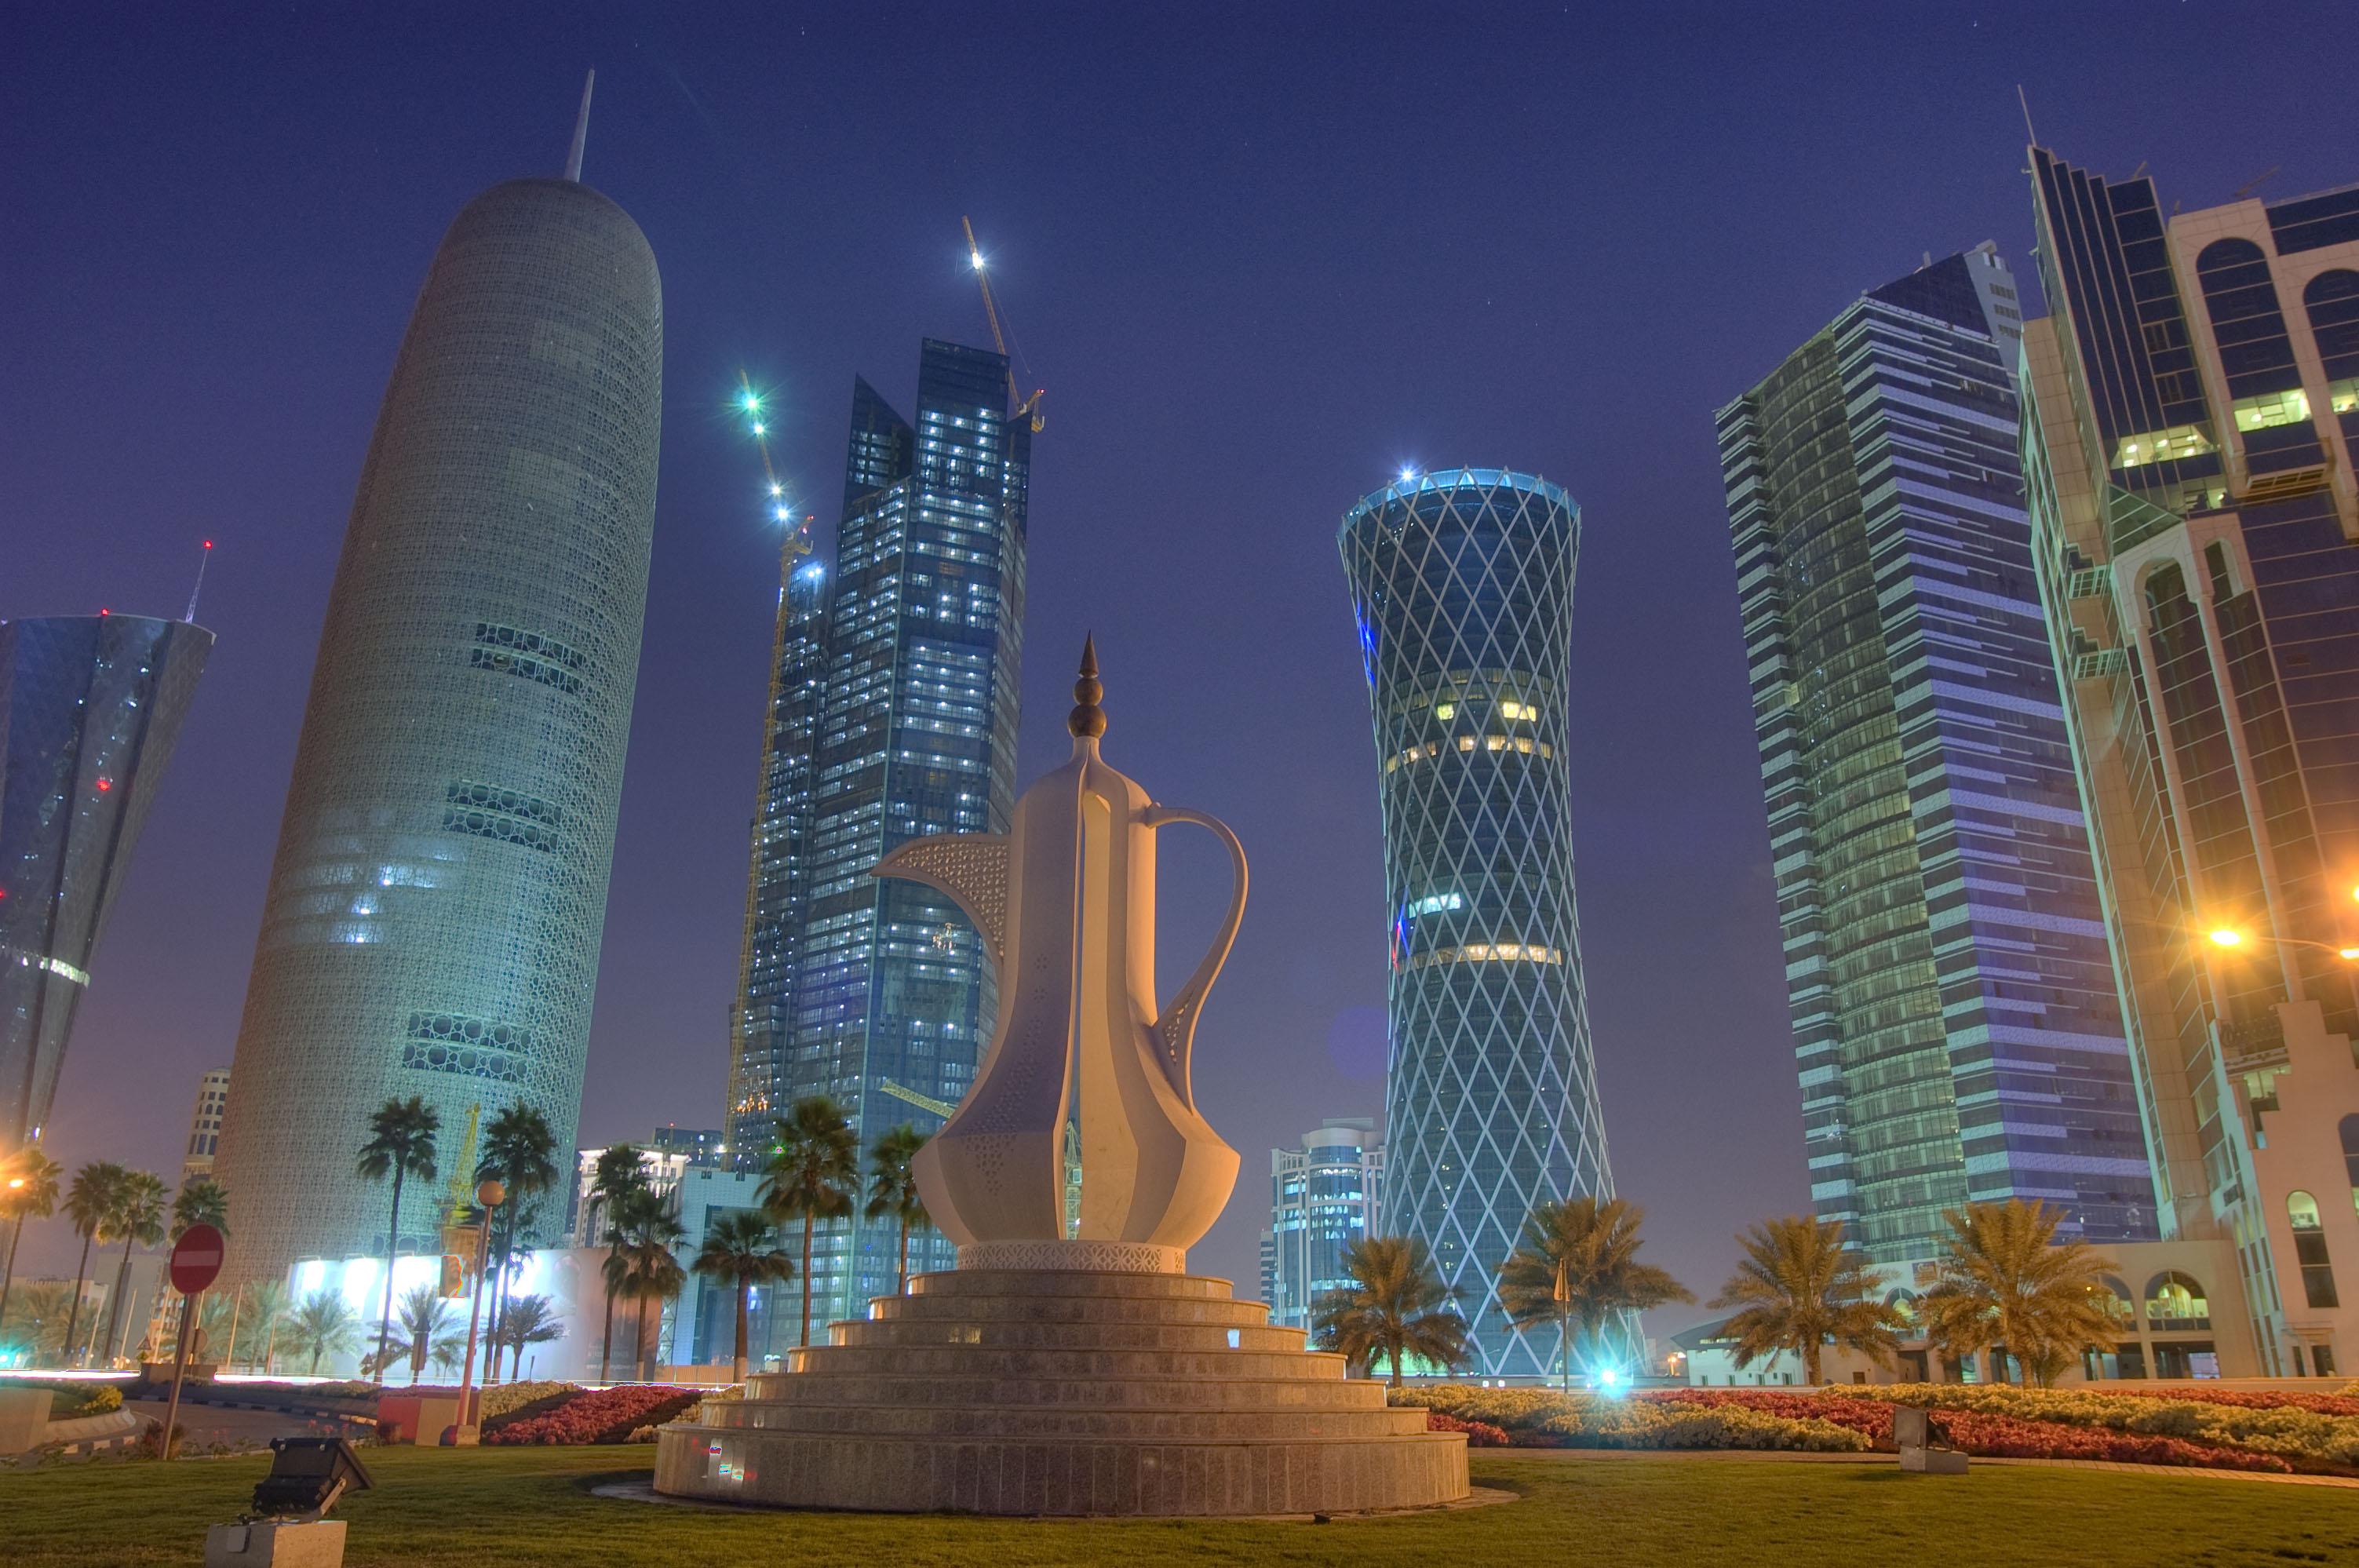 qatar - photo #45